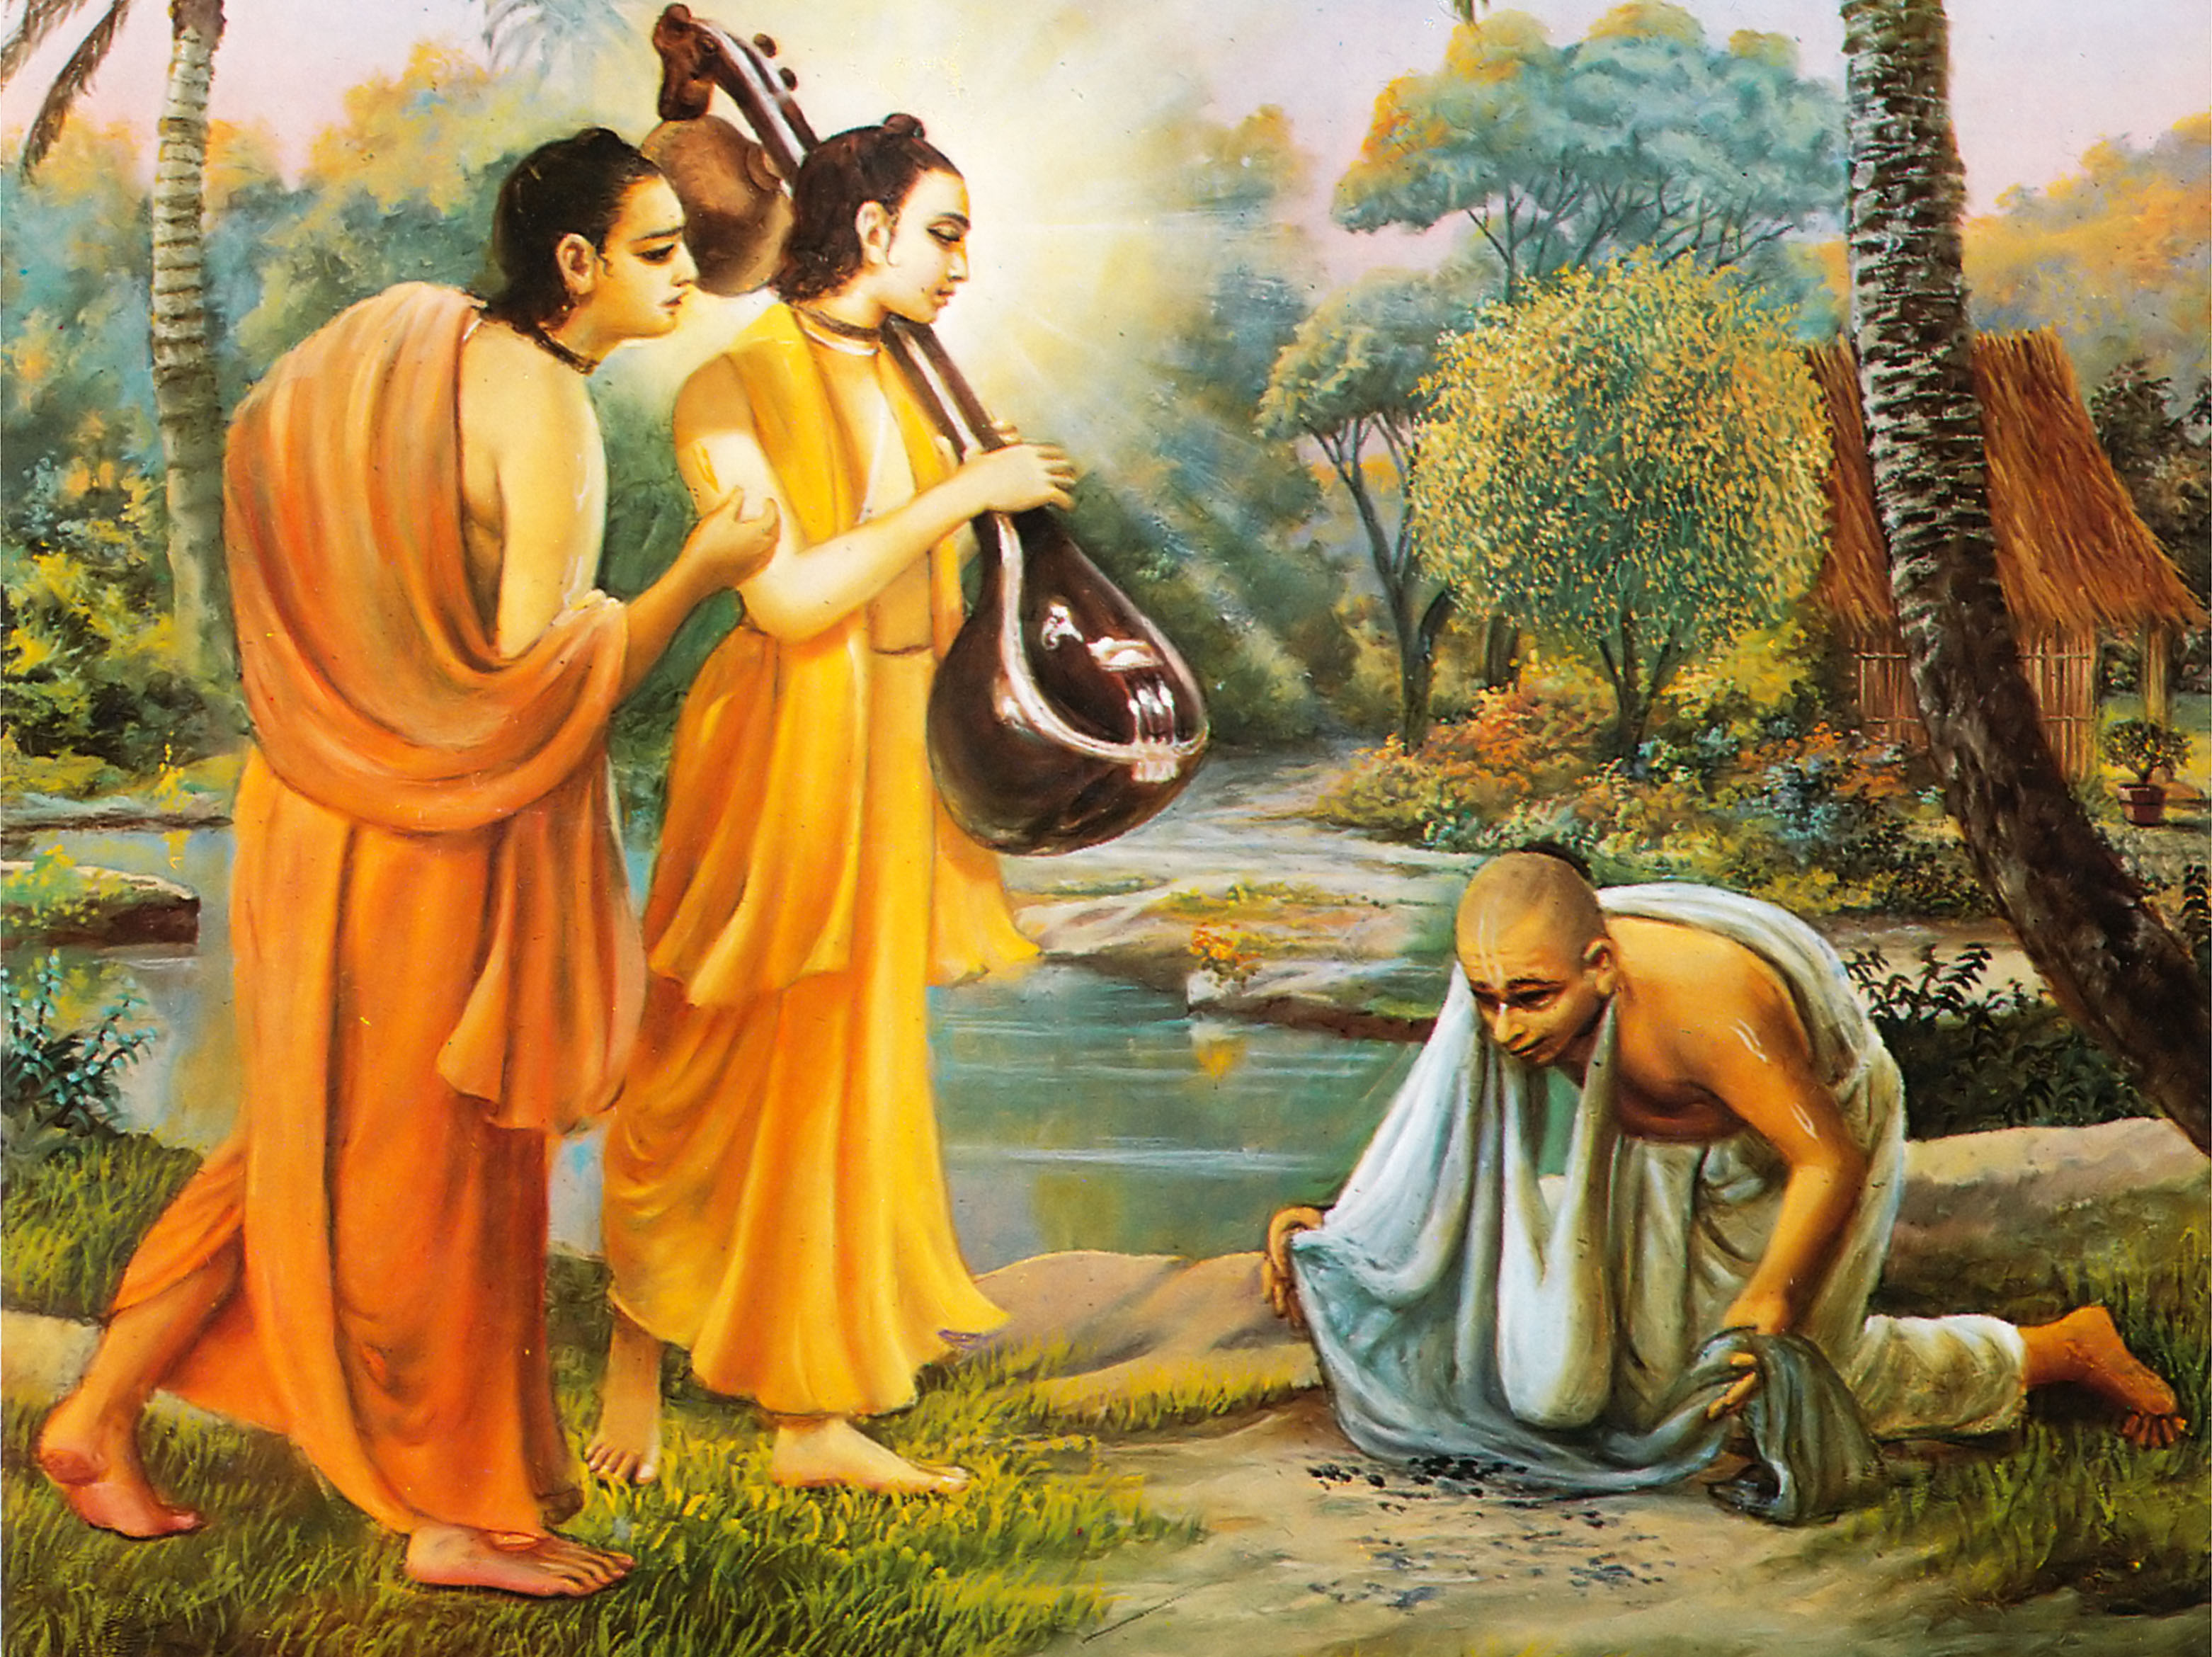 Sri Swami Samartha Full Hd Computer Wallpaper Dawlonod: Narada Muni And The Hunter